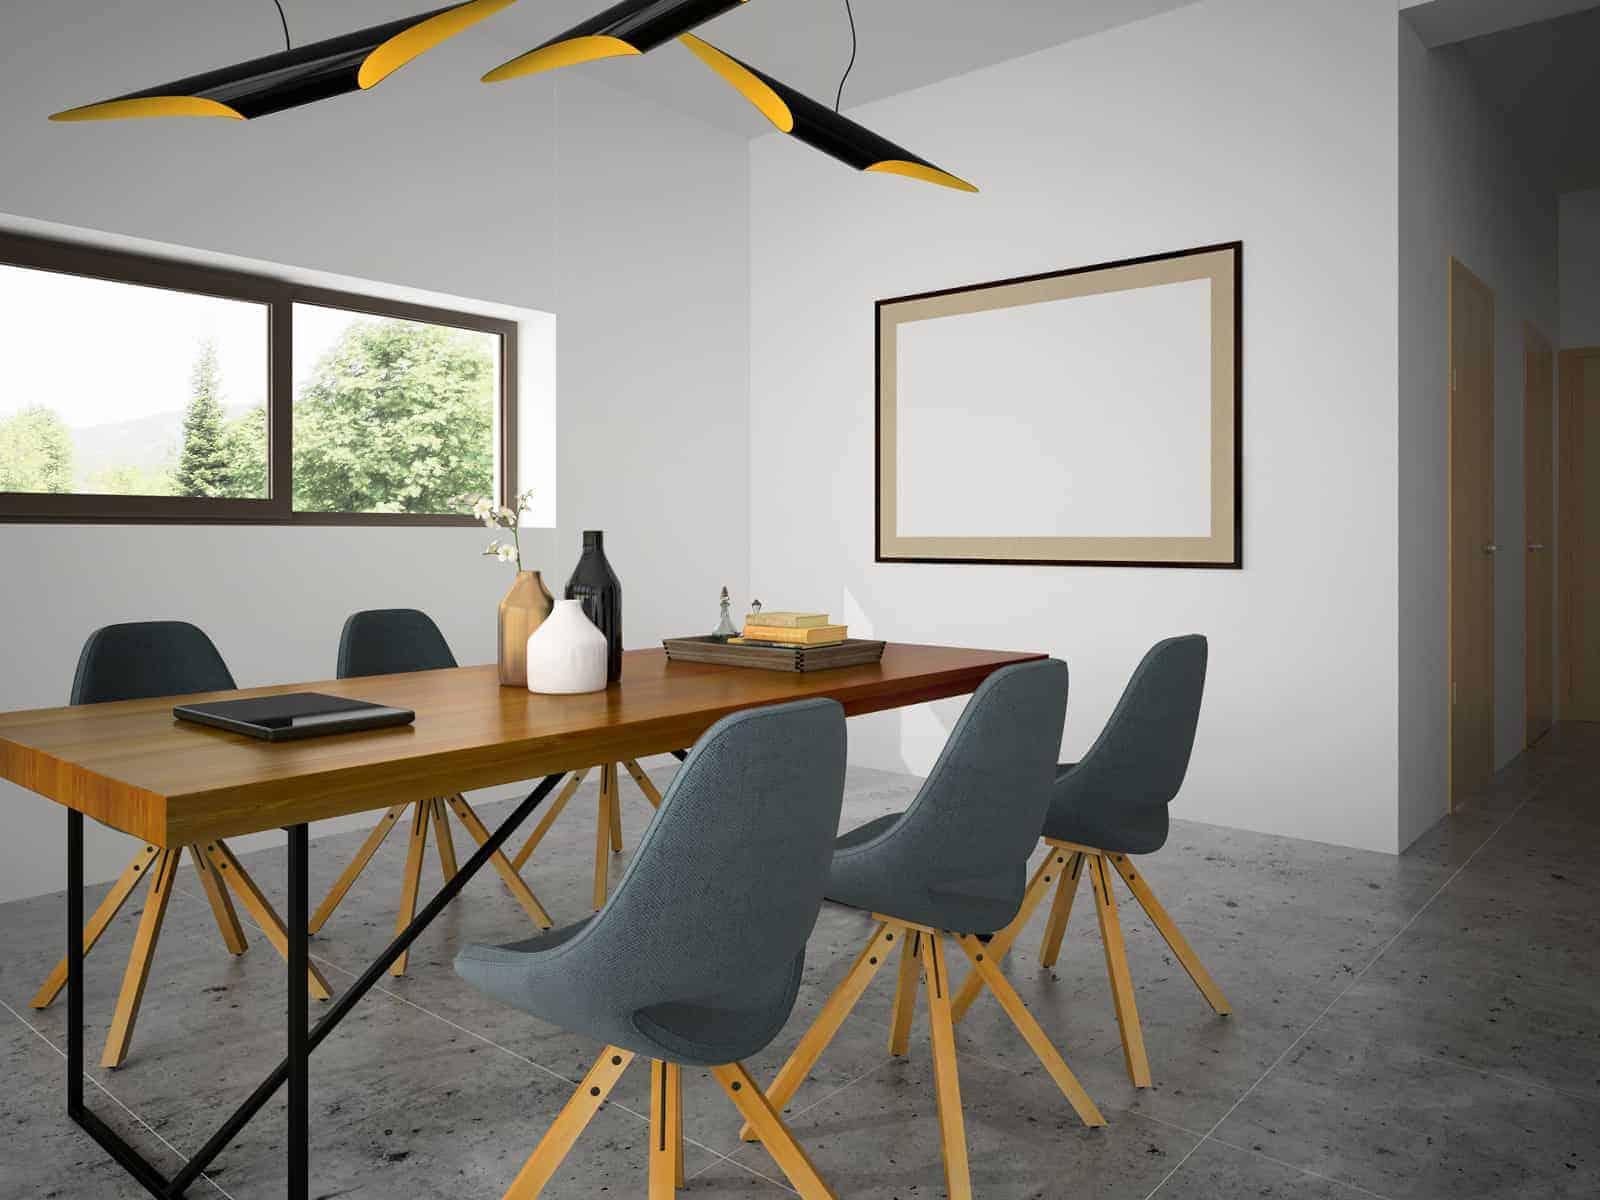 interior modern design room 3d illustration The Plus Addons for Elementor